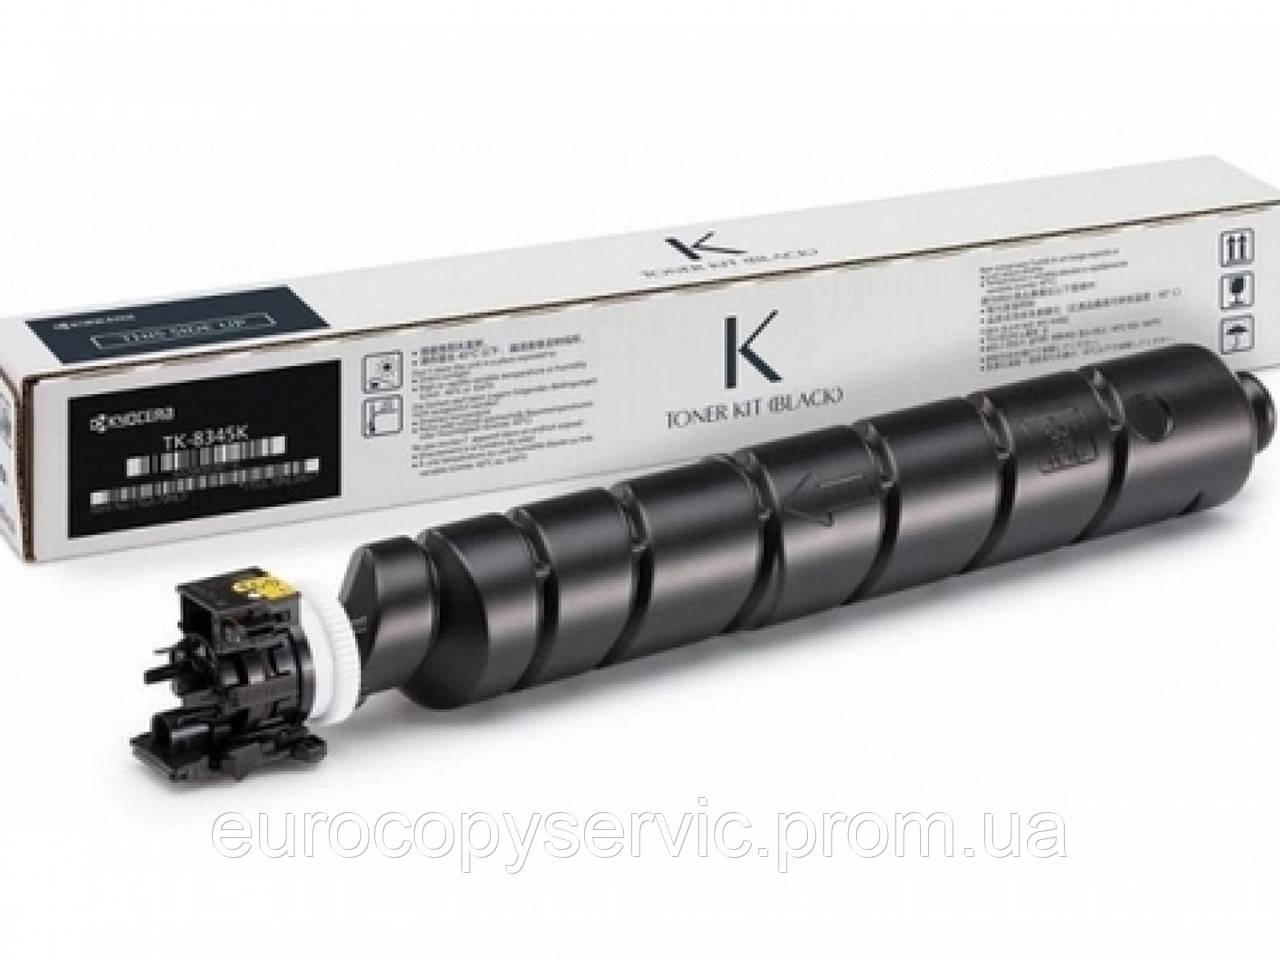 Тонер-картридж Kyocera 20K TK-8345K (1T02L70NL0) Original